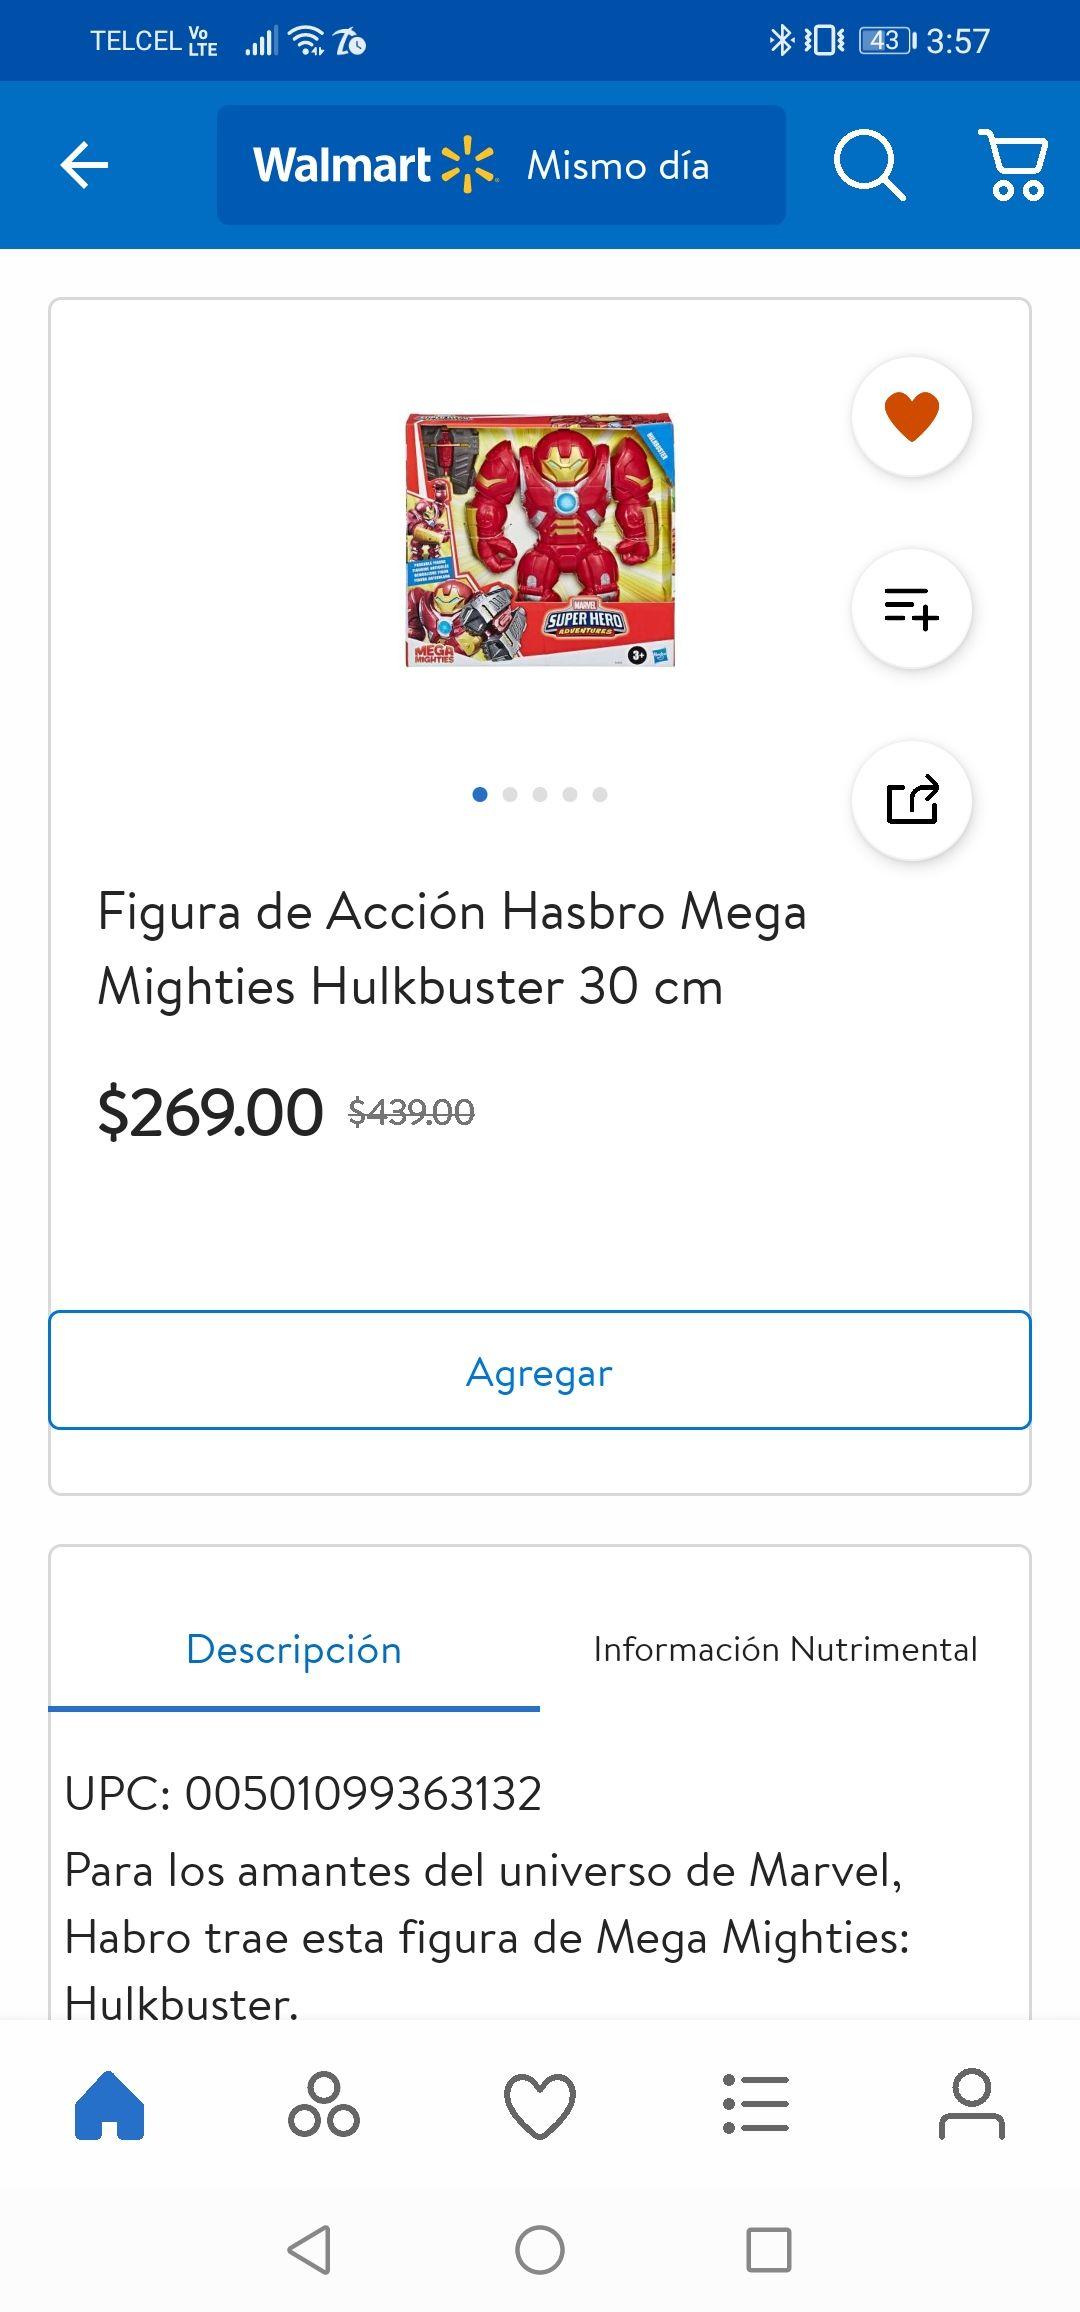 Walmart: Hulkbuster 30 cms